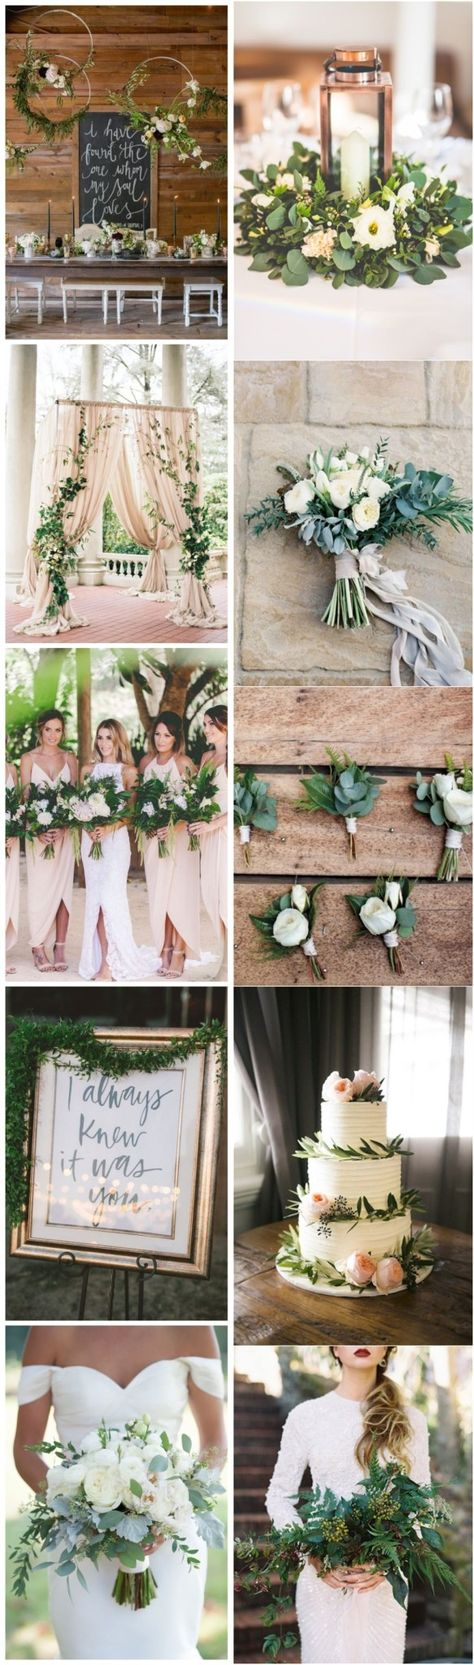 200+ Wedding Anniversary Ideas | wedding anniversary, wedding, anniversary